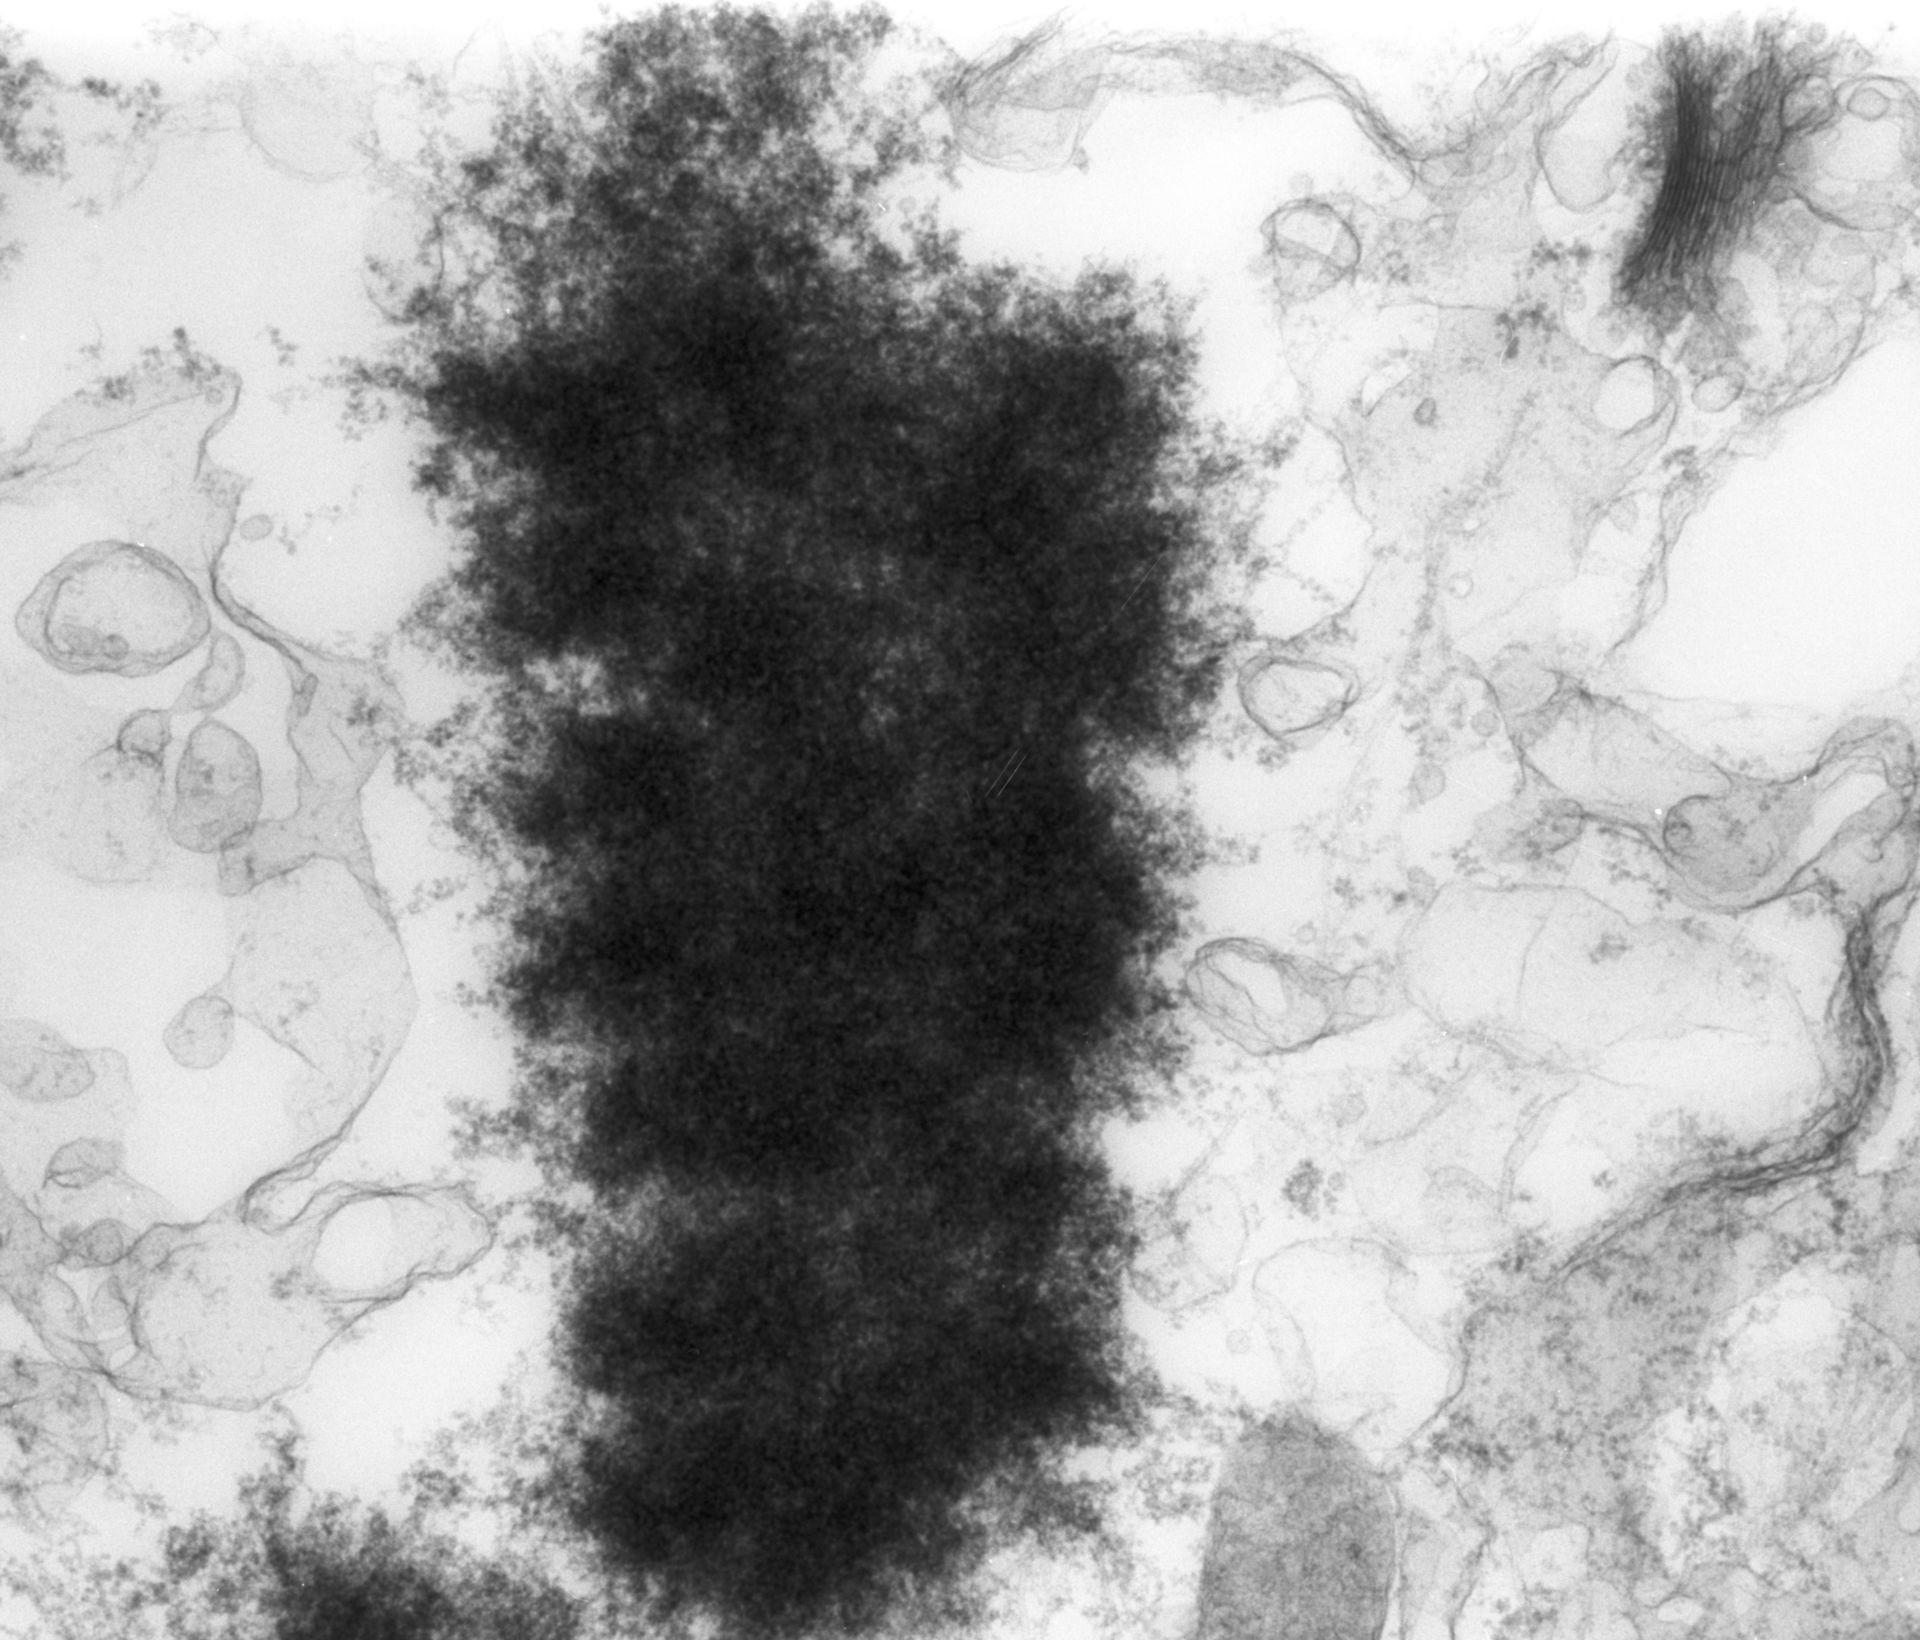 Haemanthus katharinae (Nuclear chromosome) - CIL:11903